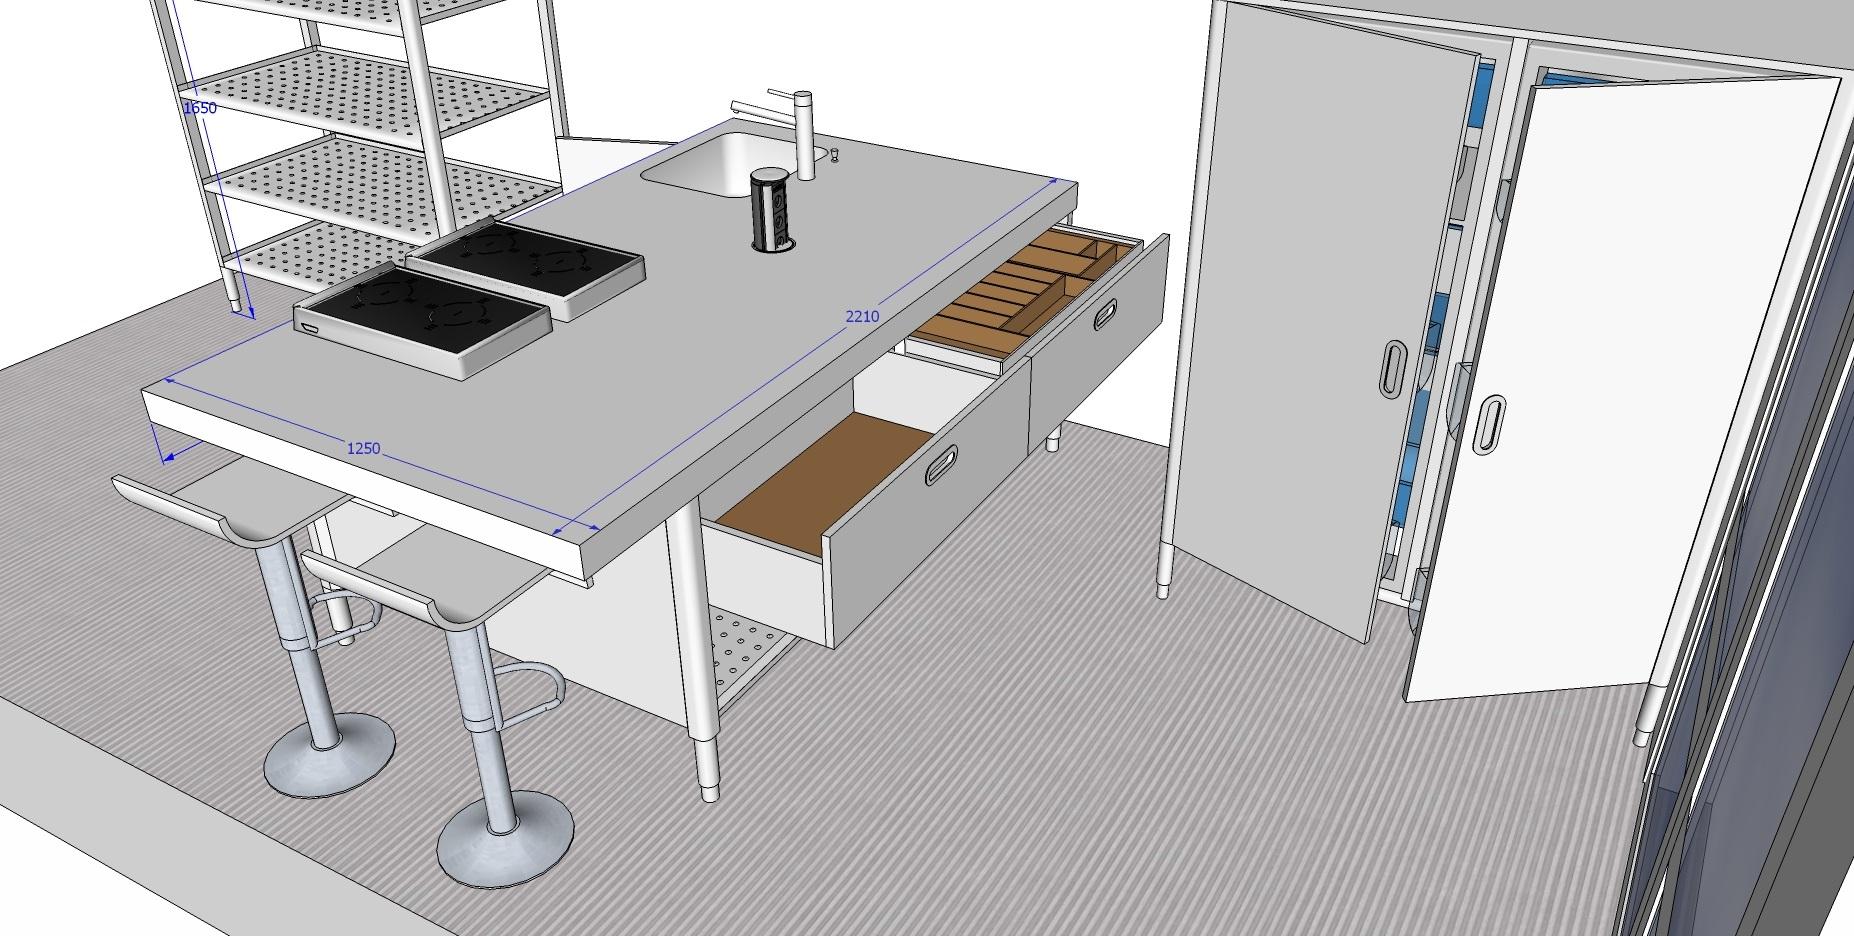 edelstahlm bel edelstahlk chen edelstahlkamine blog edel elegant extravagant. Black Bedroom Furniture Sets. Home Design Ideas